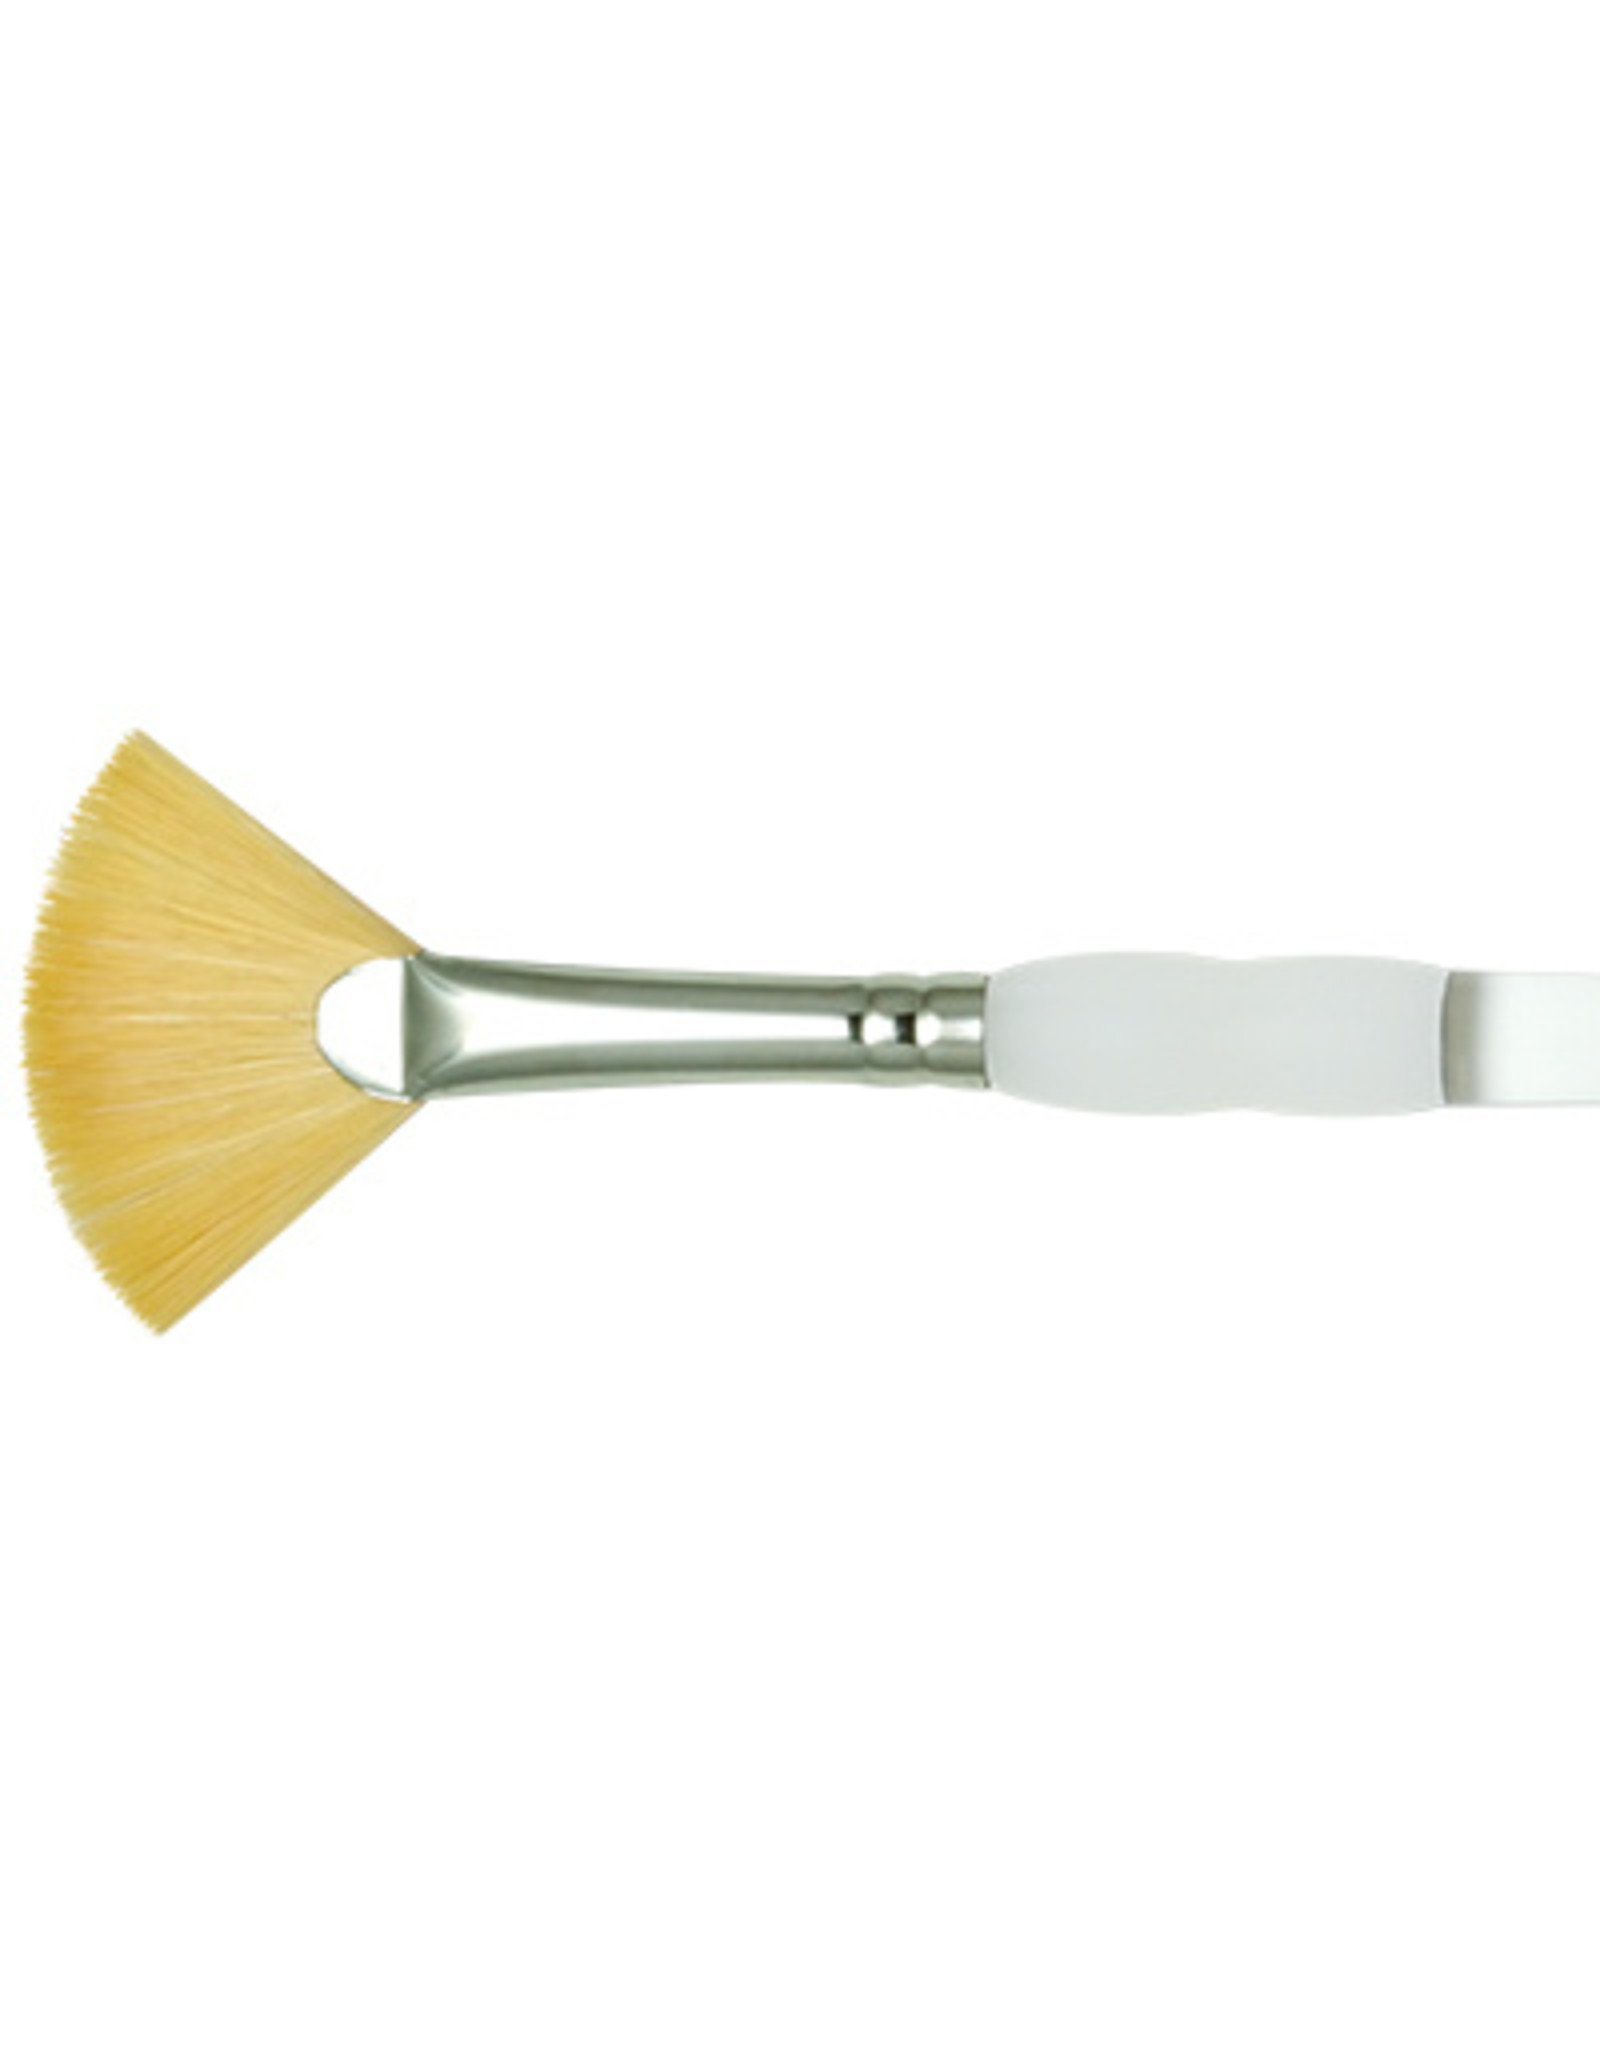 Royal & Langnickel Soft Grip FAN 6 Gold Taklon